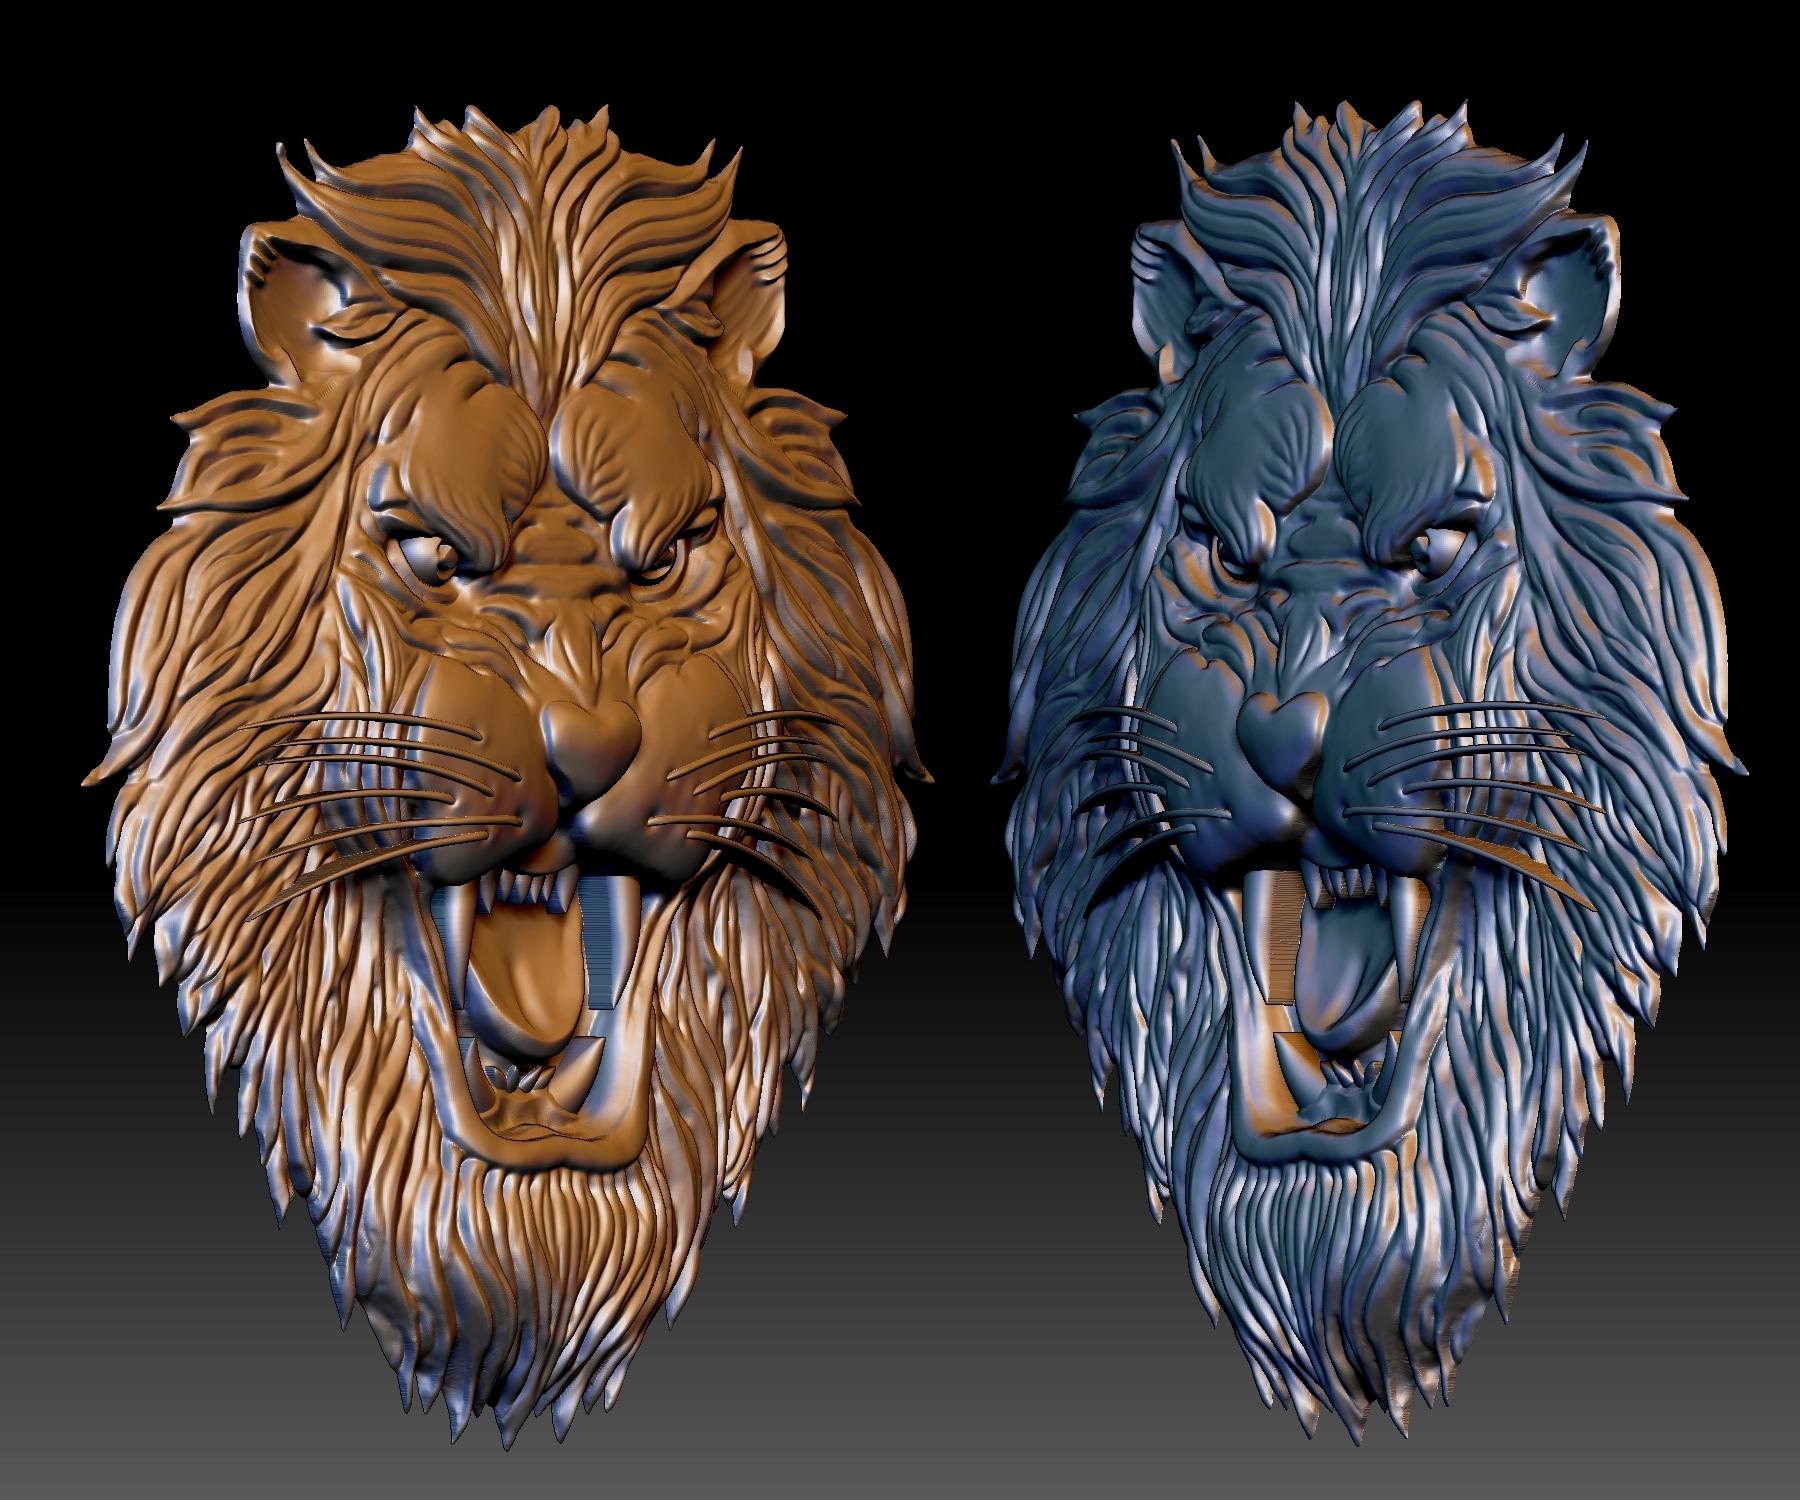 Download STL file Lion head STL file 3d model - relief for